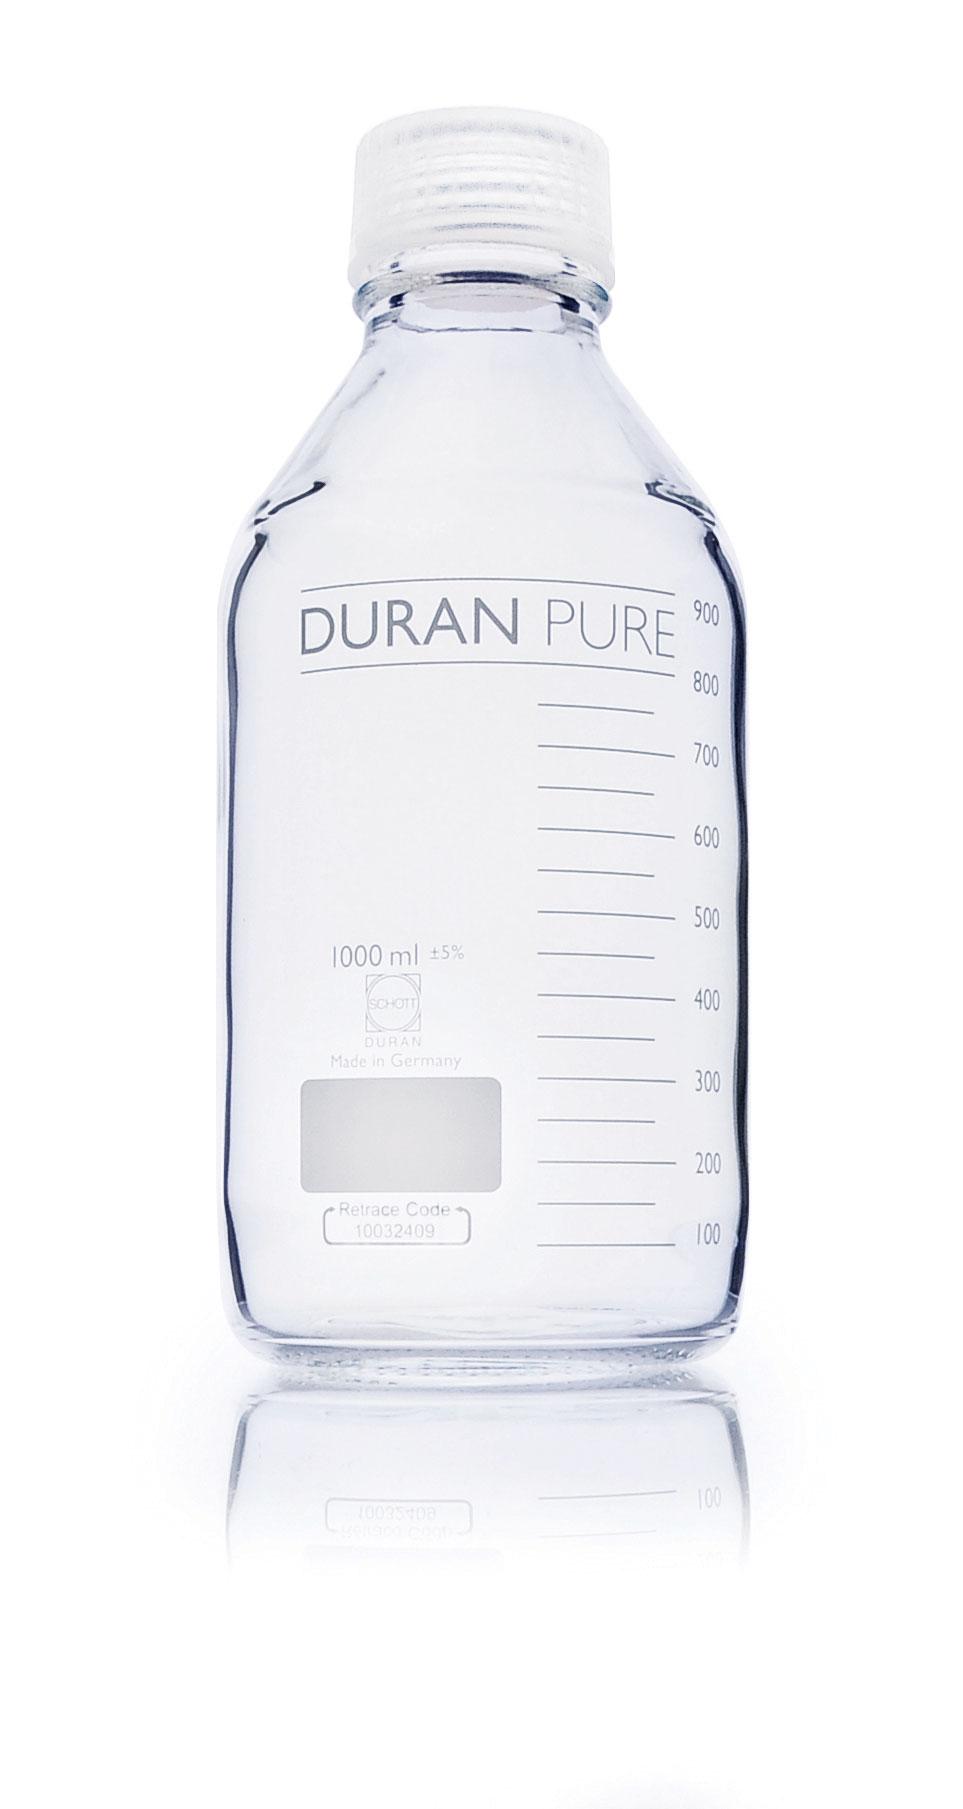 DURAN PURE BOROSILLICATE GLASS BOTTLES : The LabMart, Highest